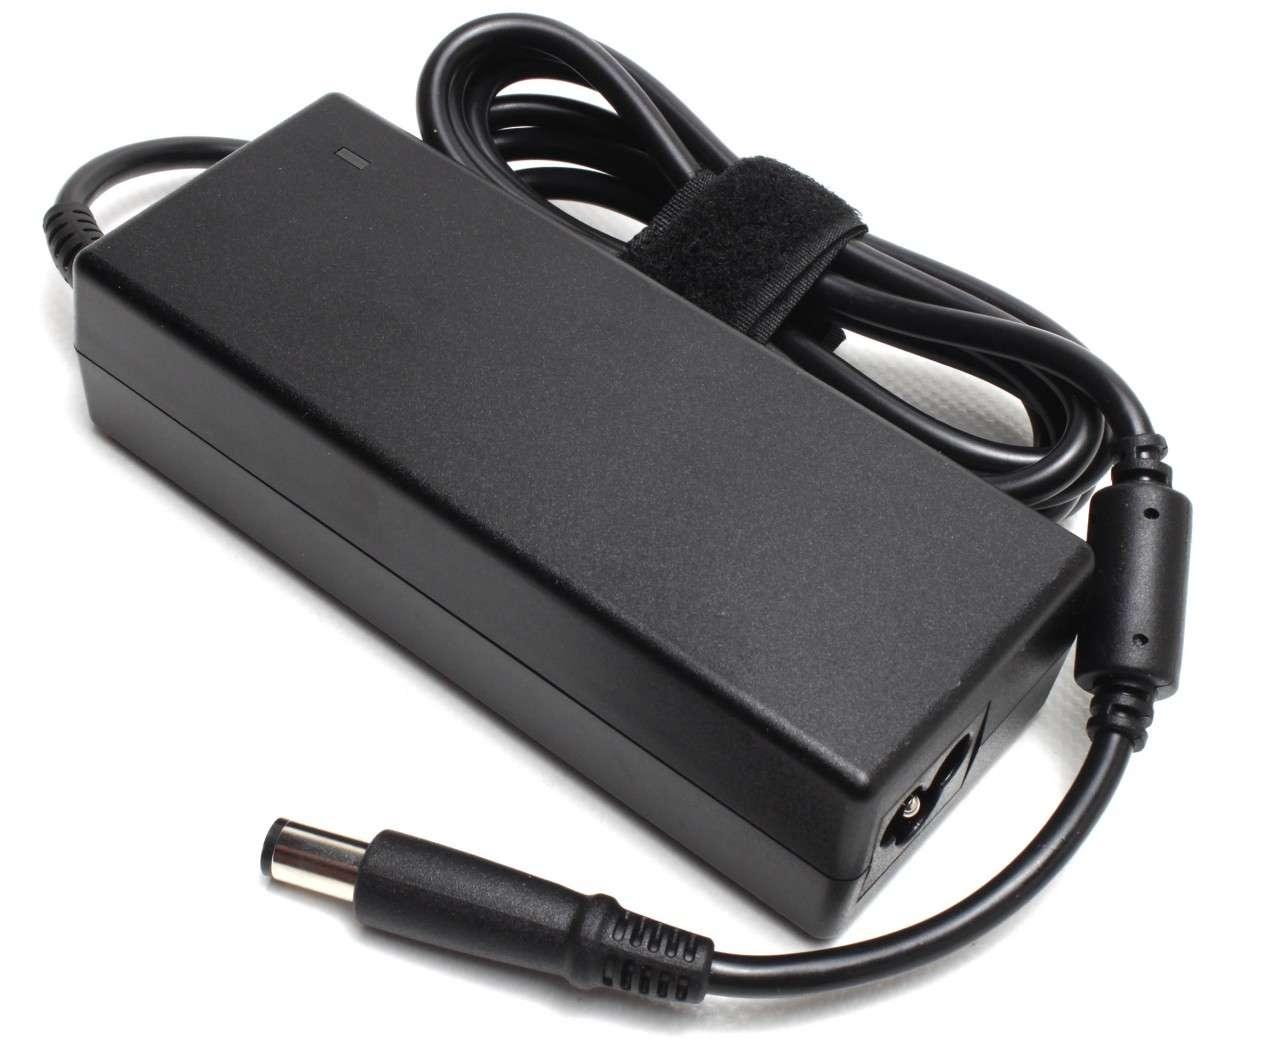 Incarcator Dell Inspiron M501r VARIANTA 3 imagine powerlaptop.ro 2021